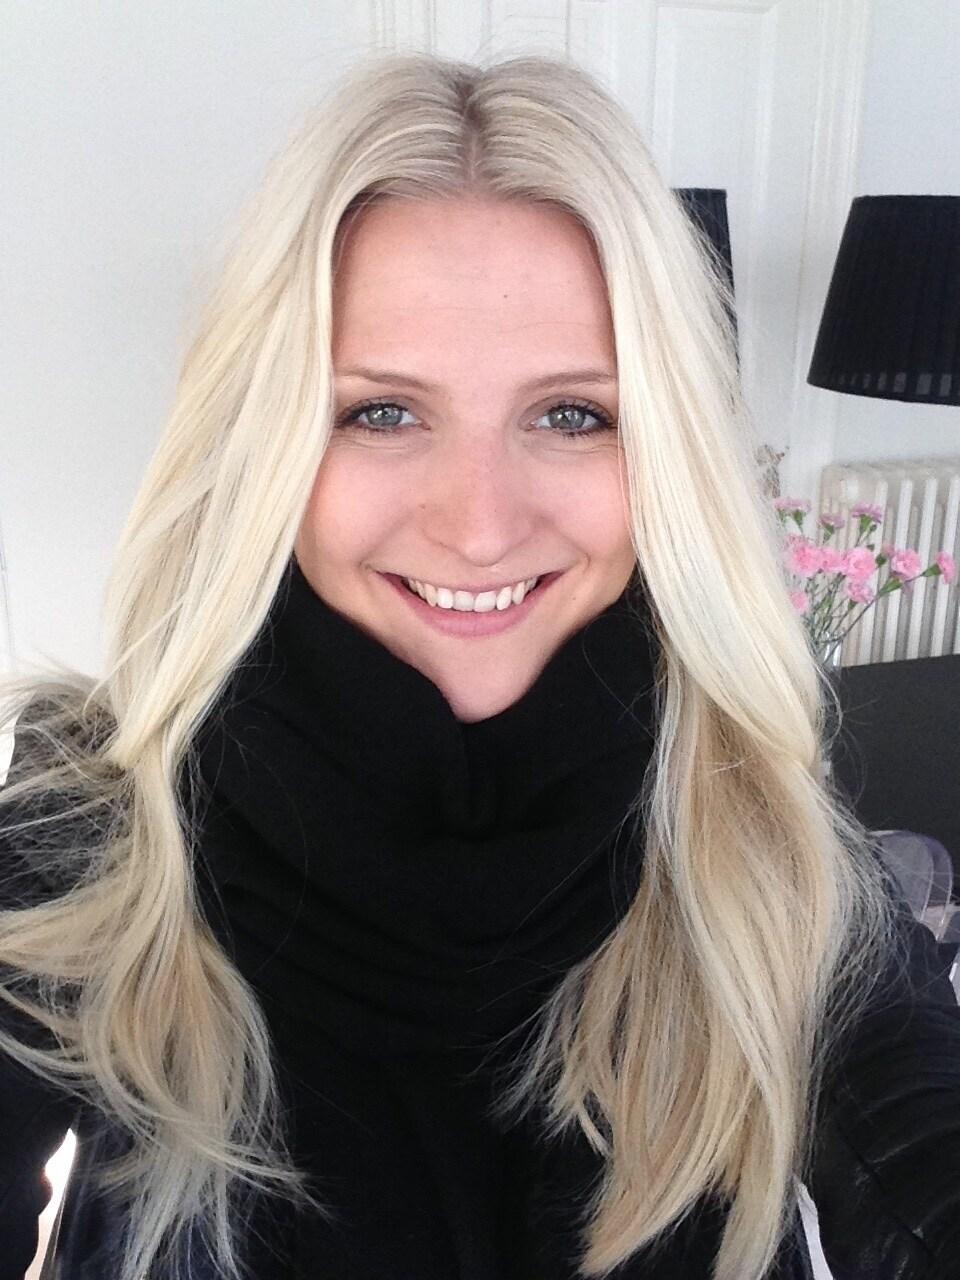 26 year old student from Copenhagen, Denmark.